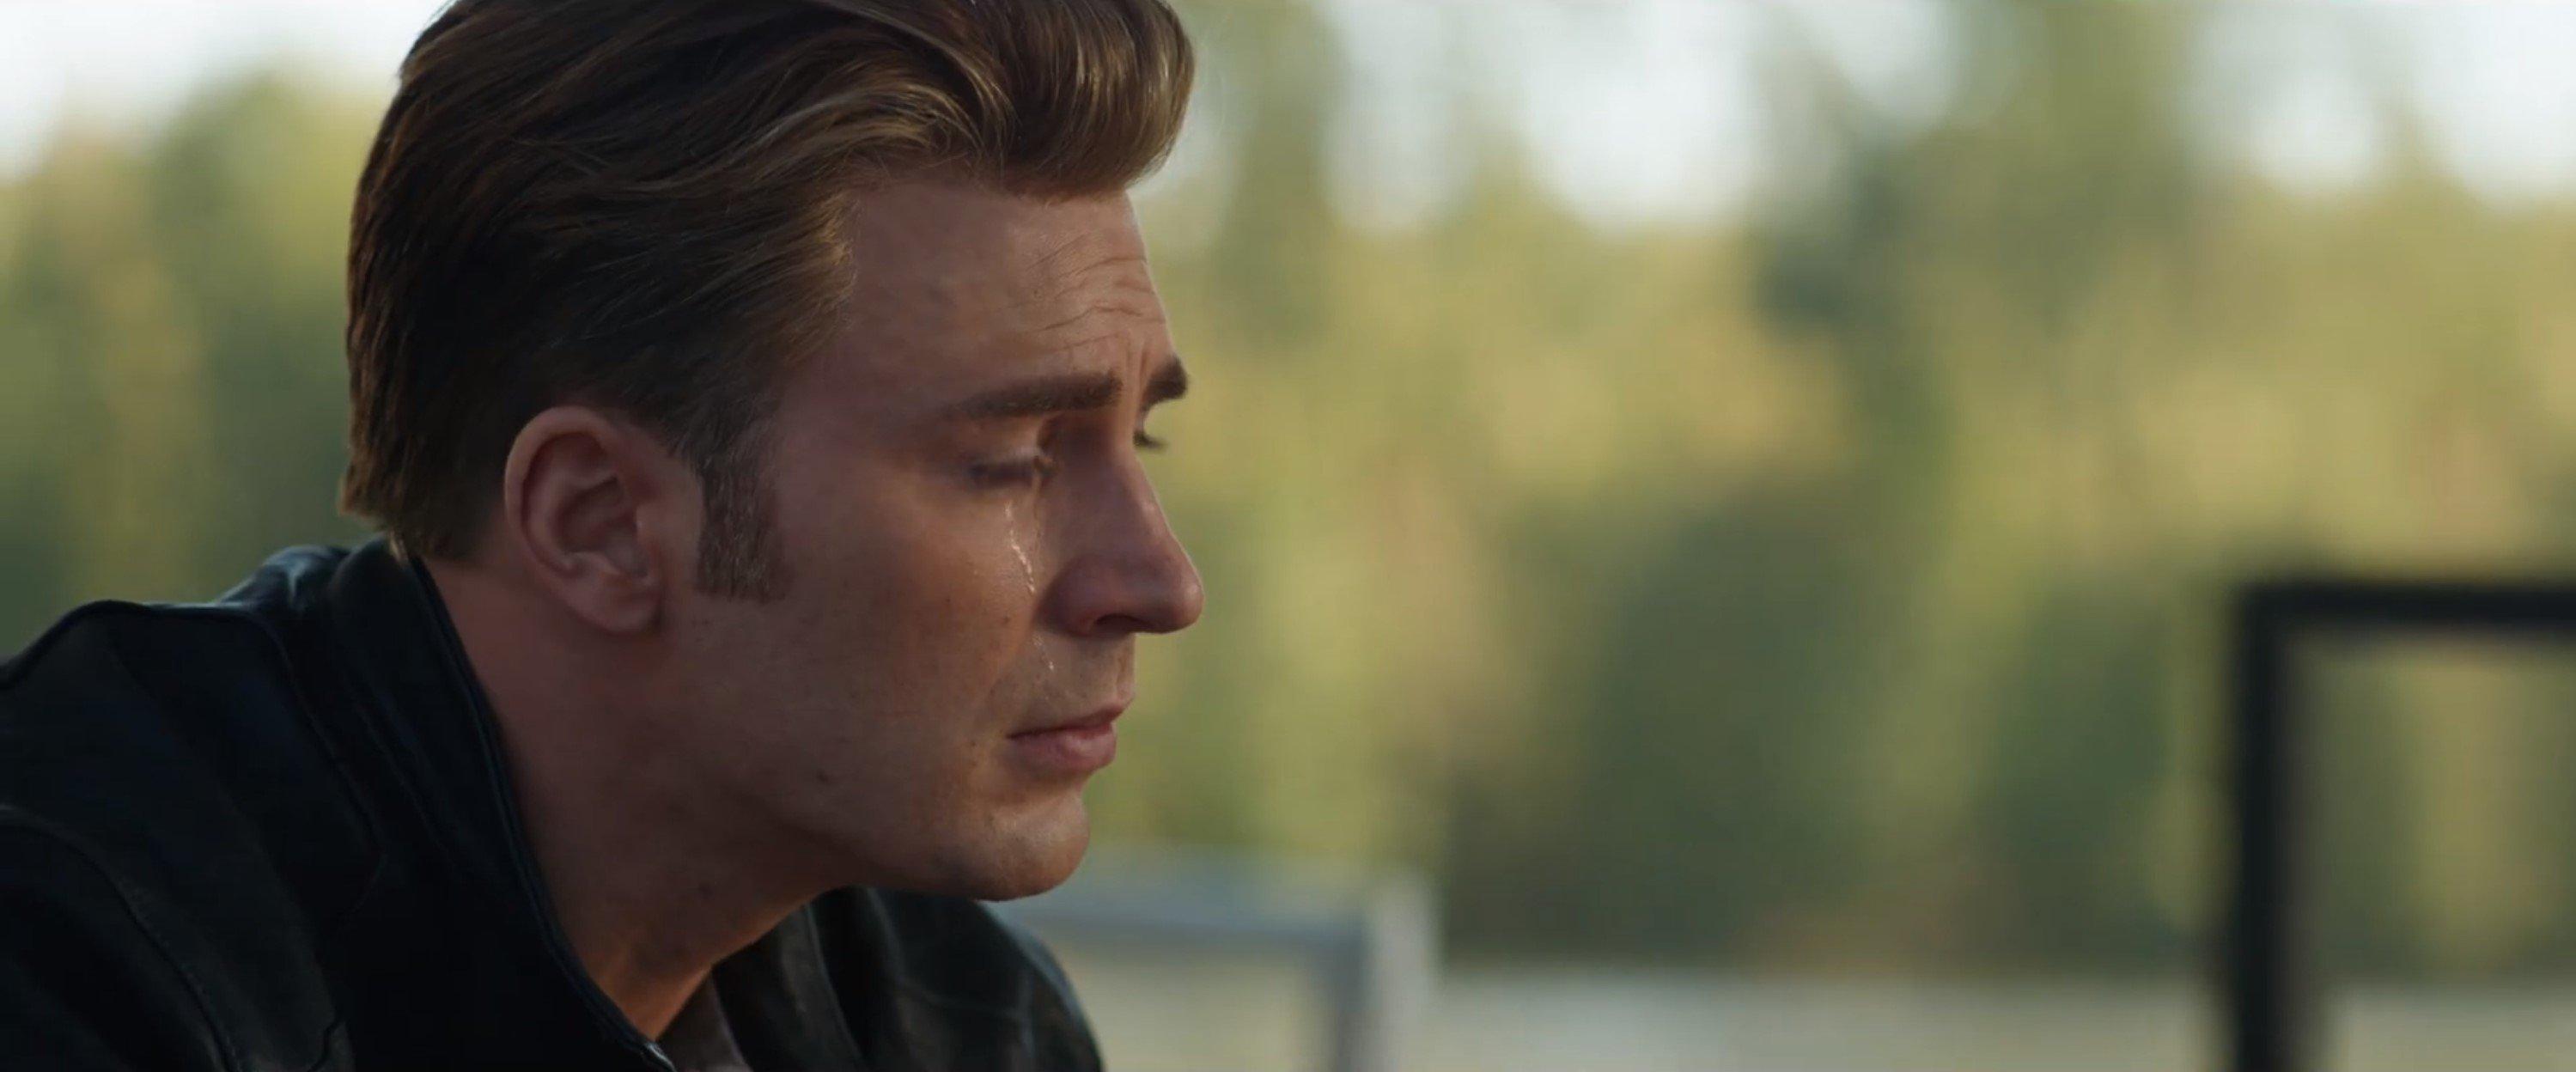 Мстители: Финал. Капитан Америка